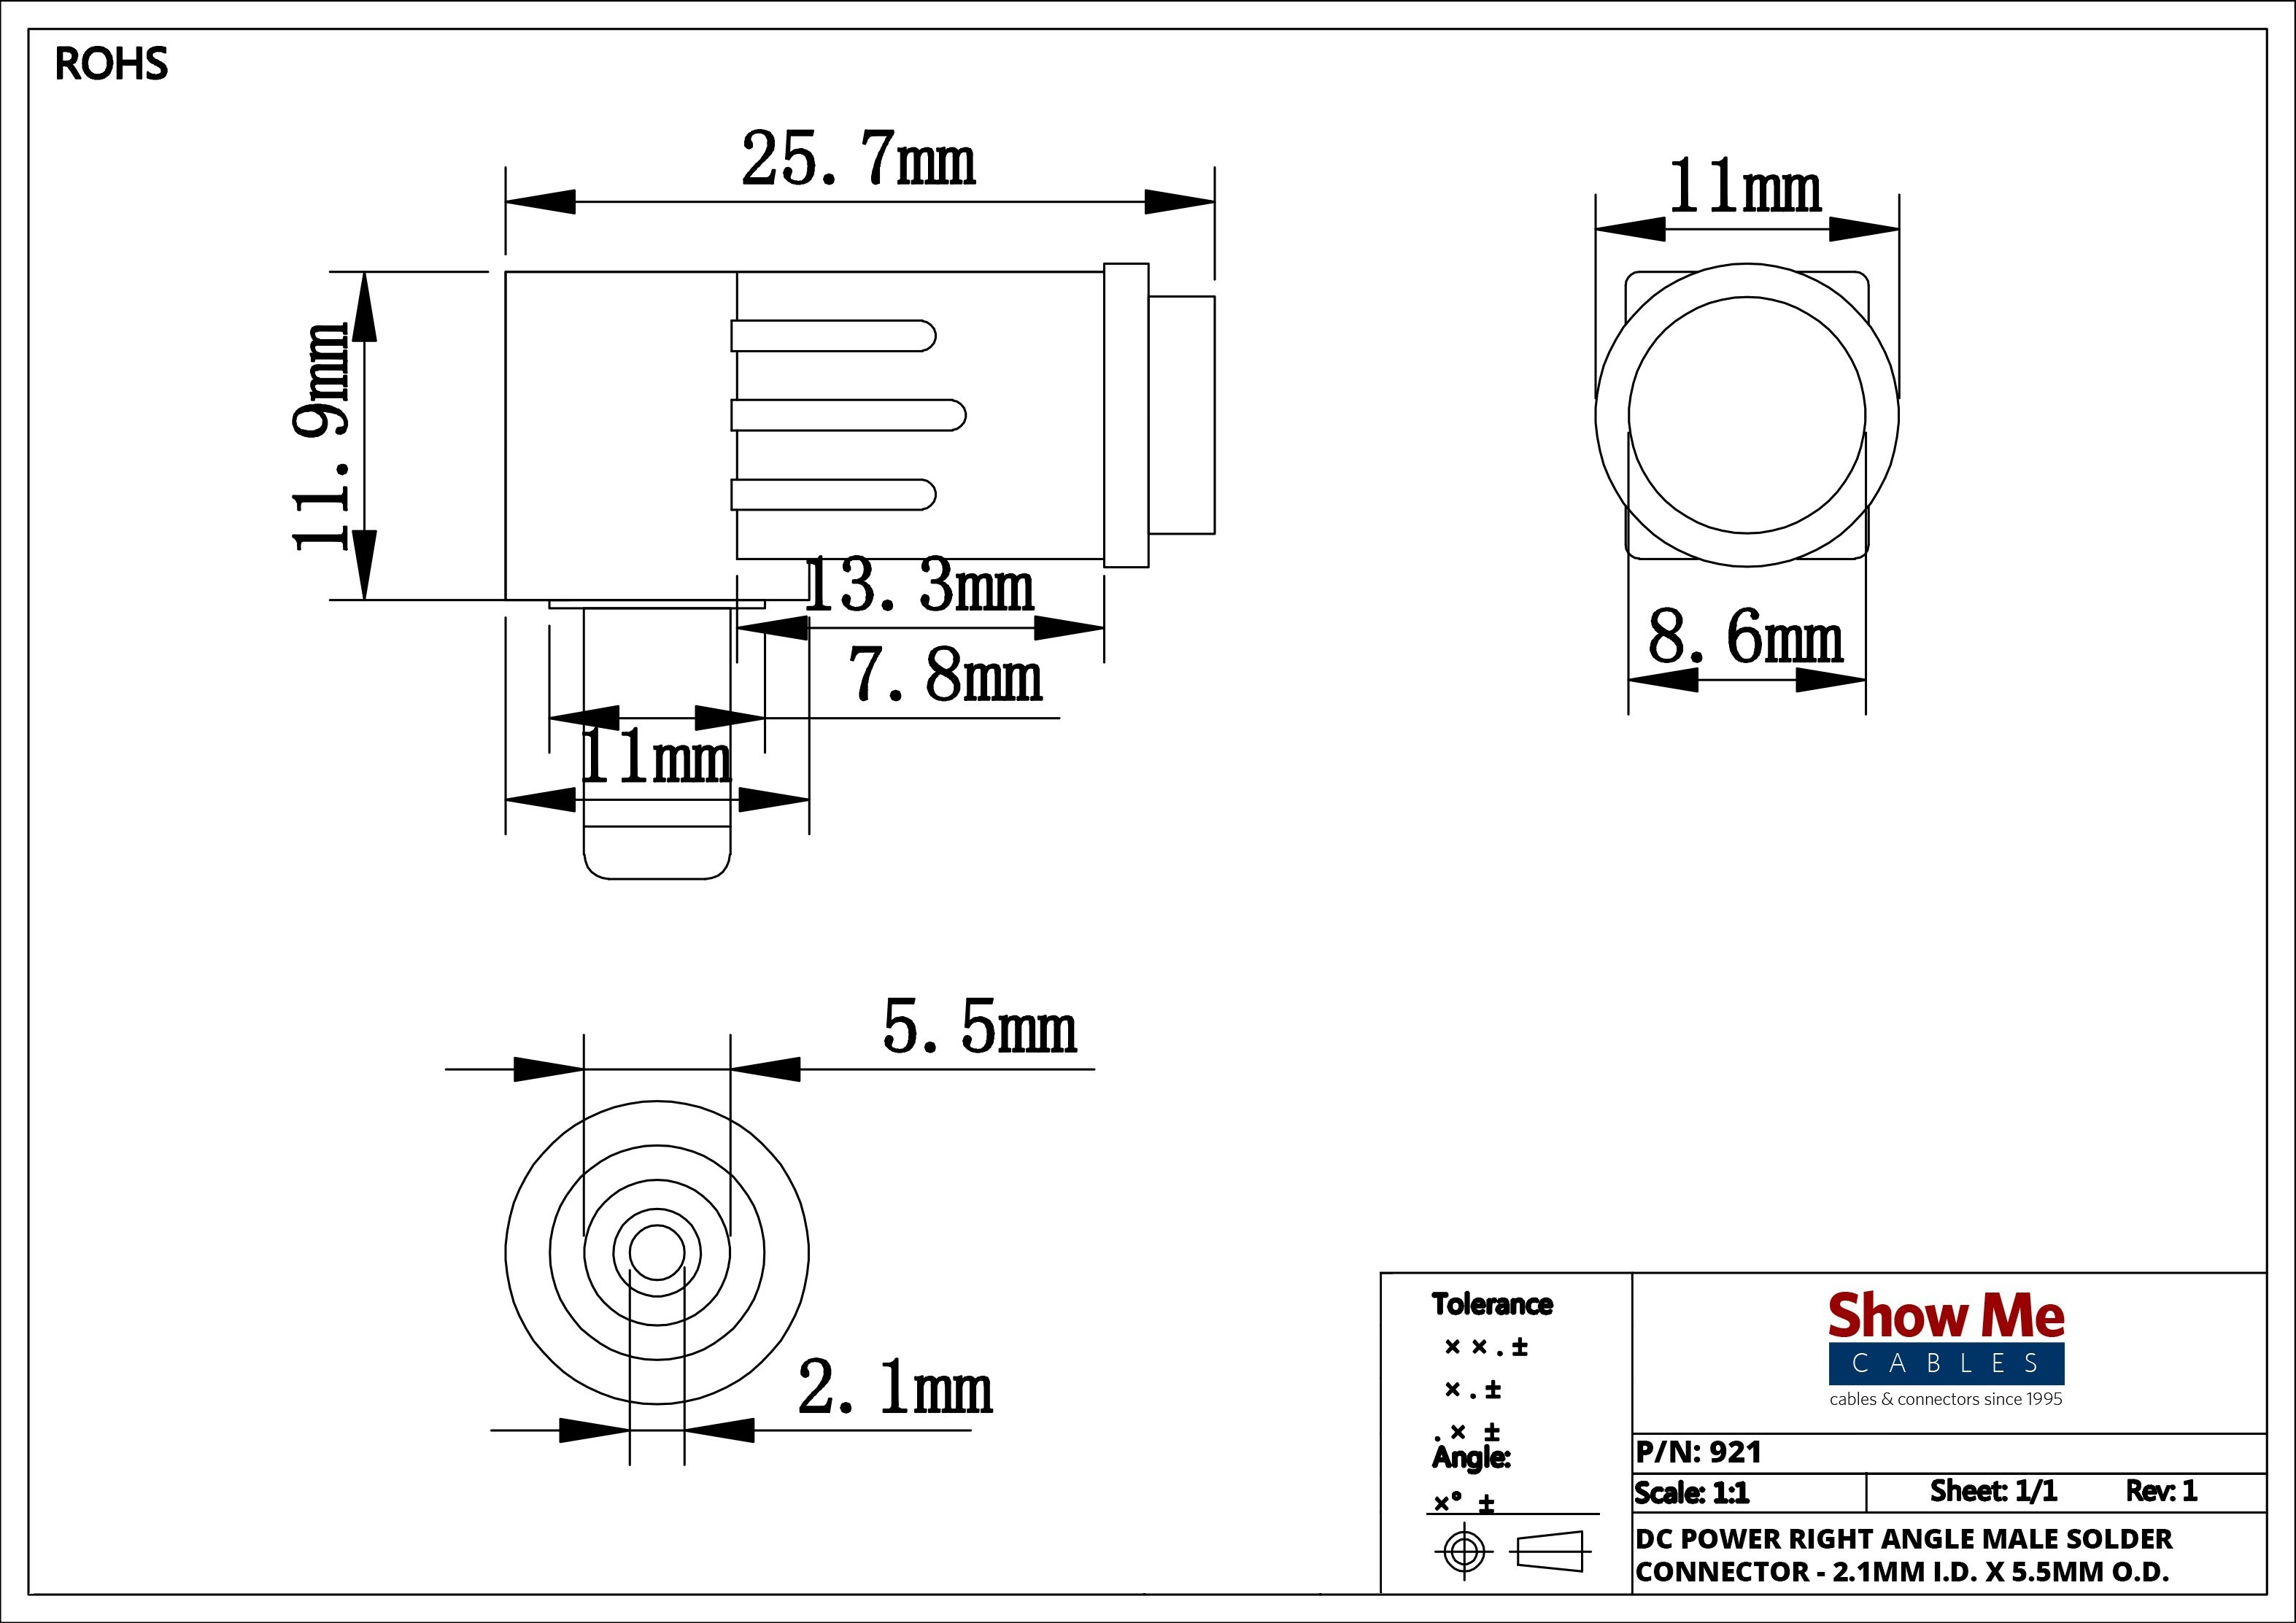 3 5 Mm Jack Wiring Diagram Electrical Circuit Diagram New 3 5 Mm Jack Wiring Diagram Fresh 2 Of 3 5 Mm Jack Wiring Diagram